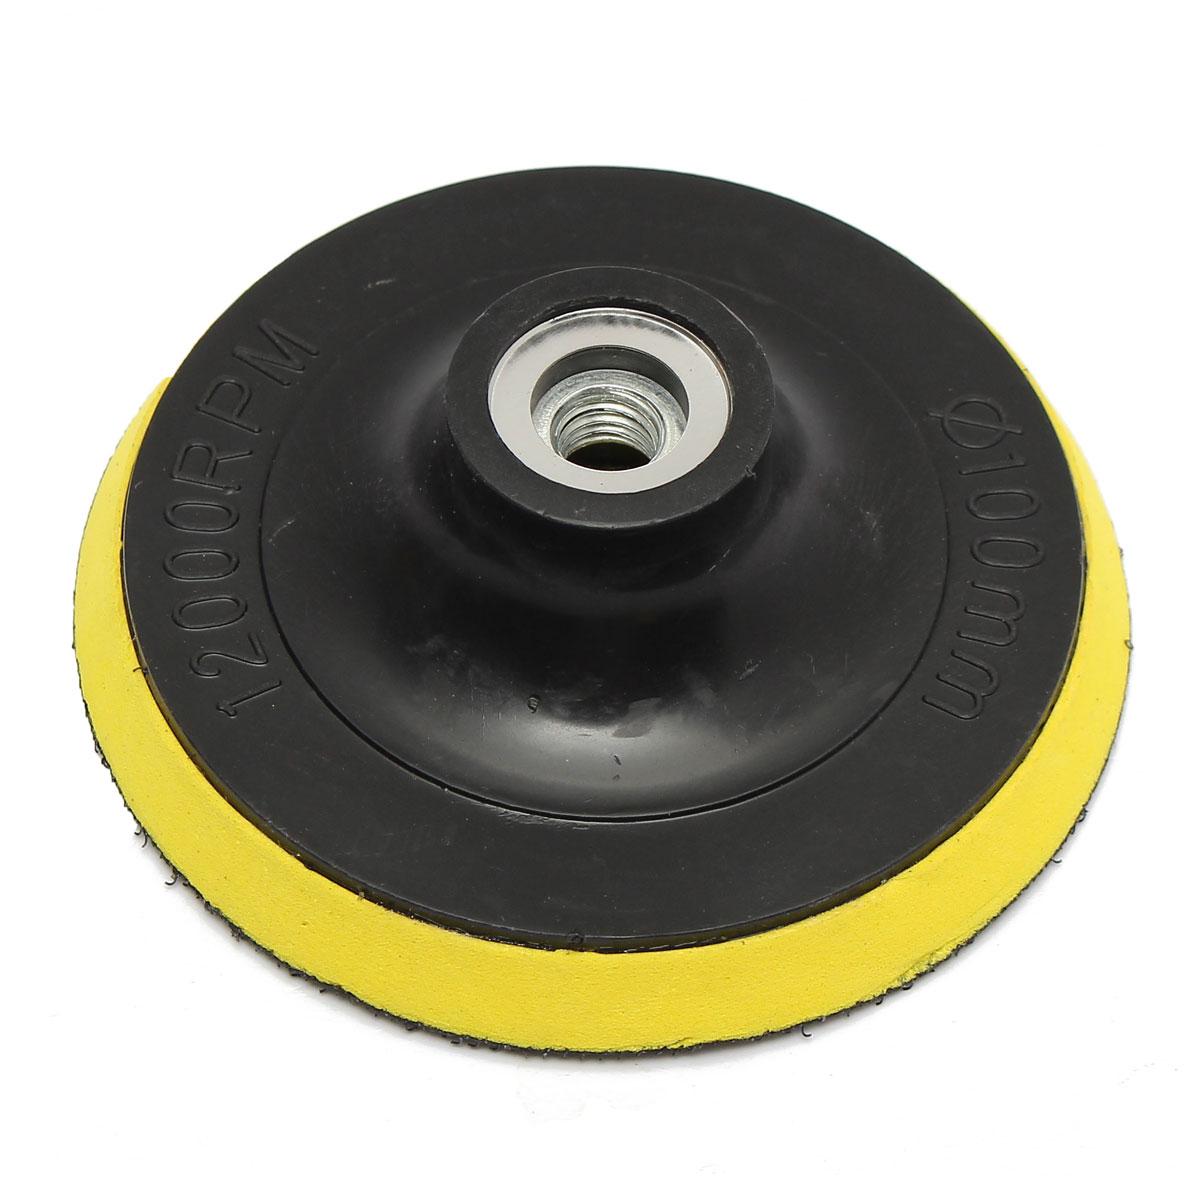 4 100mm Selfadhesive disc Brushed Polisher Bonnet Backing Pad Angle Grinder Polishing Disk Wheel Sand Paper